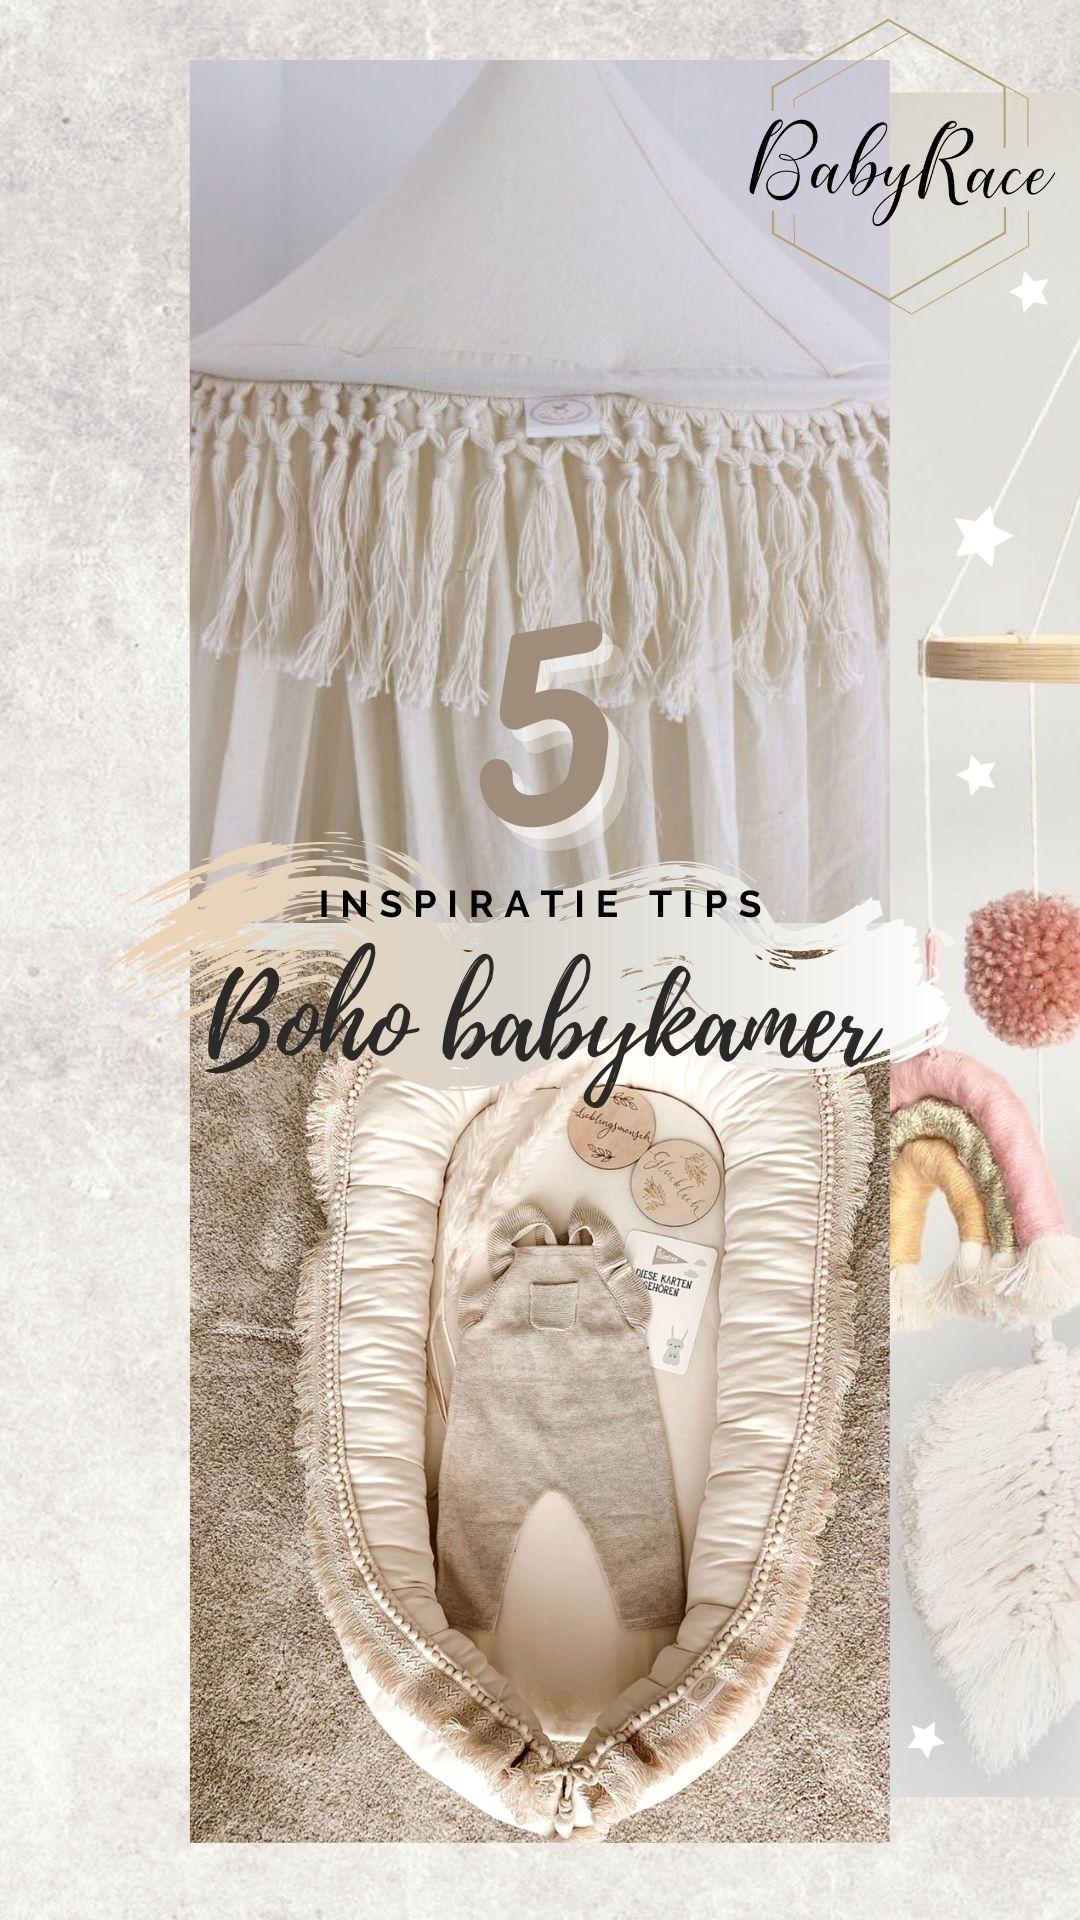 boho babykamer inspiratie tips - babyrace